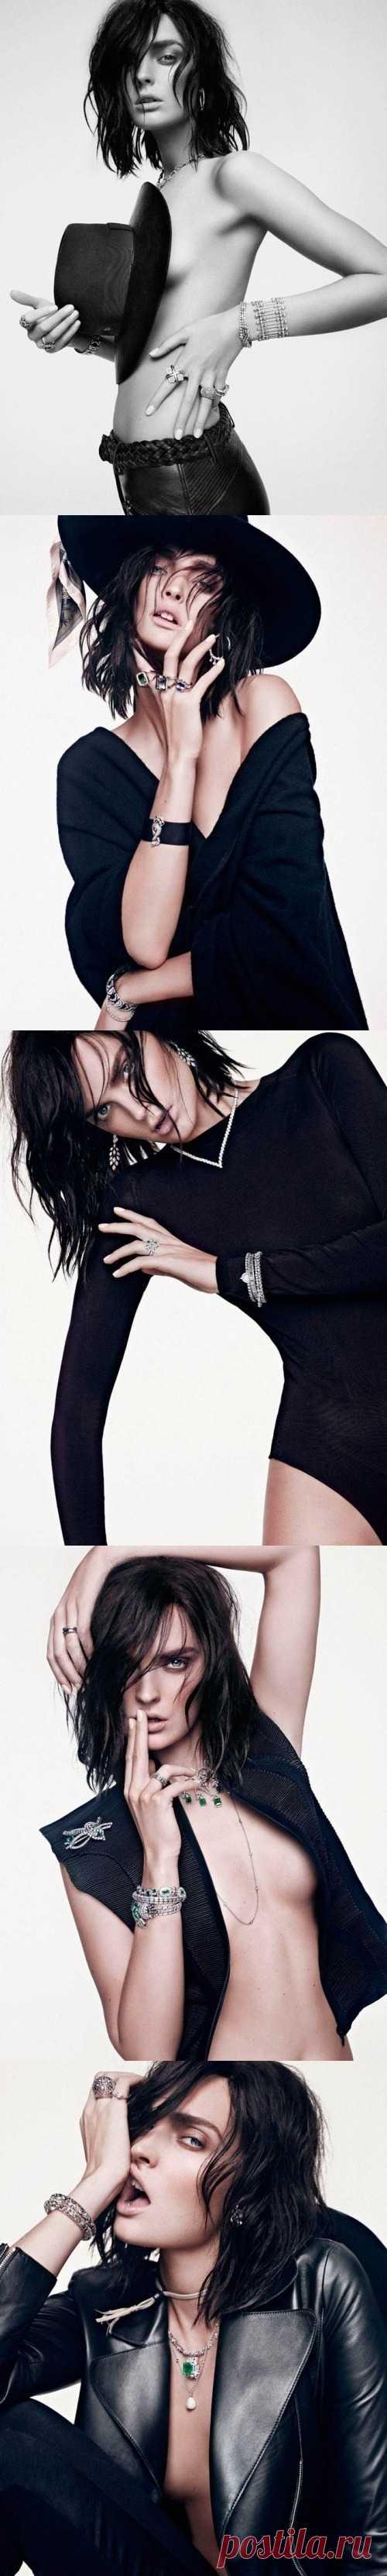 Андрогенная красота от Vogue Spain